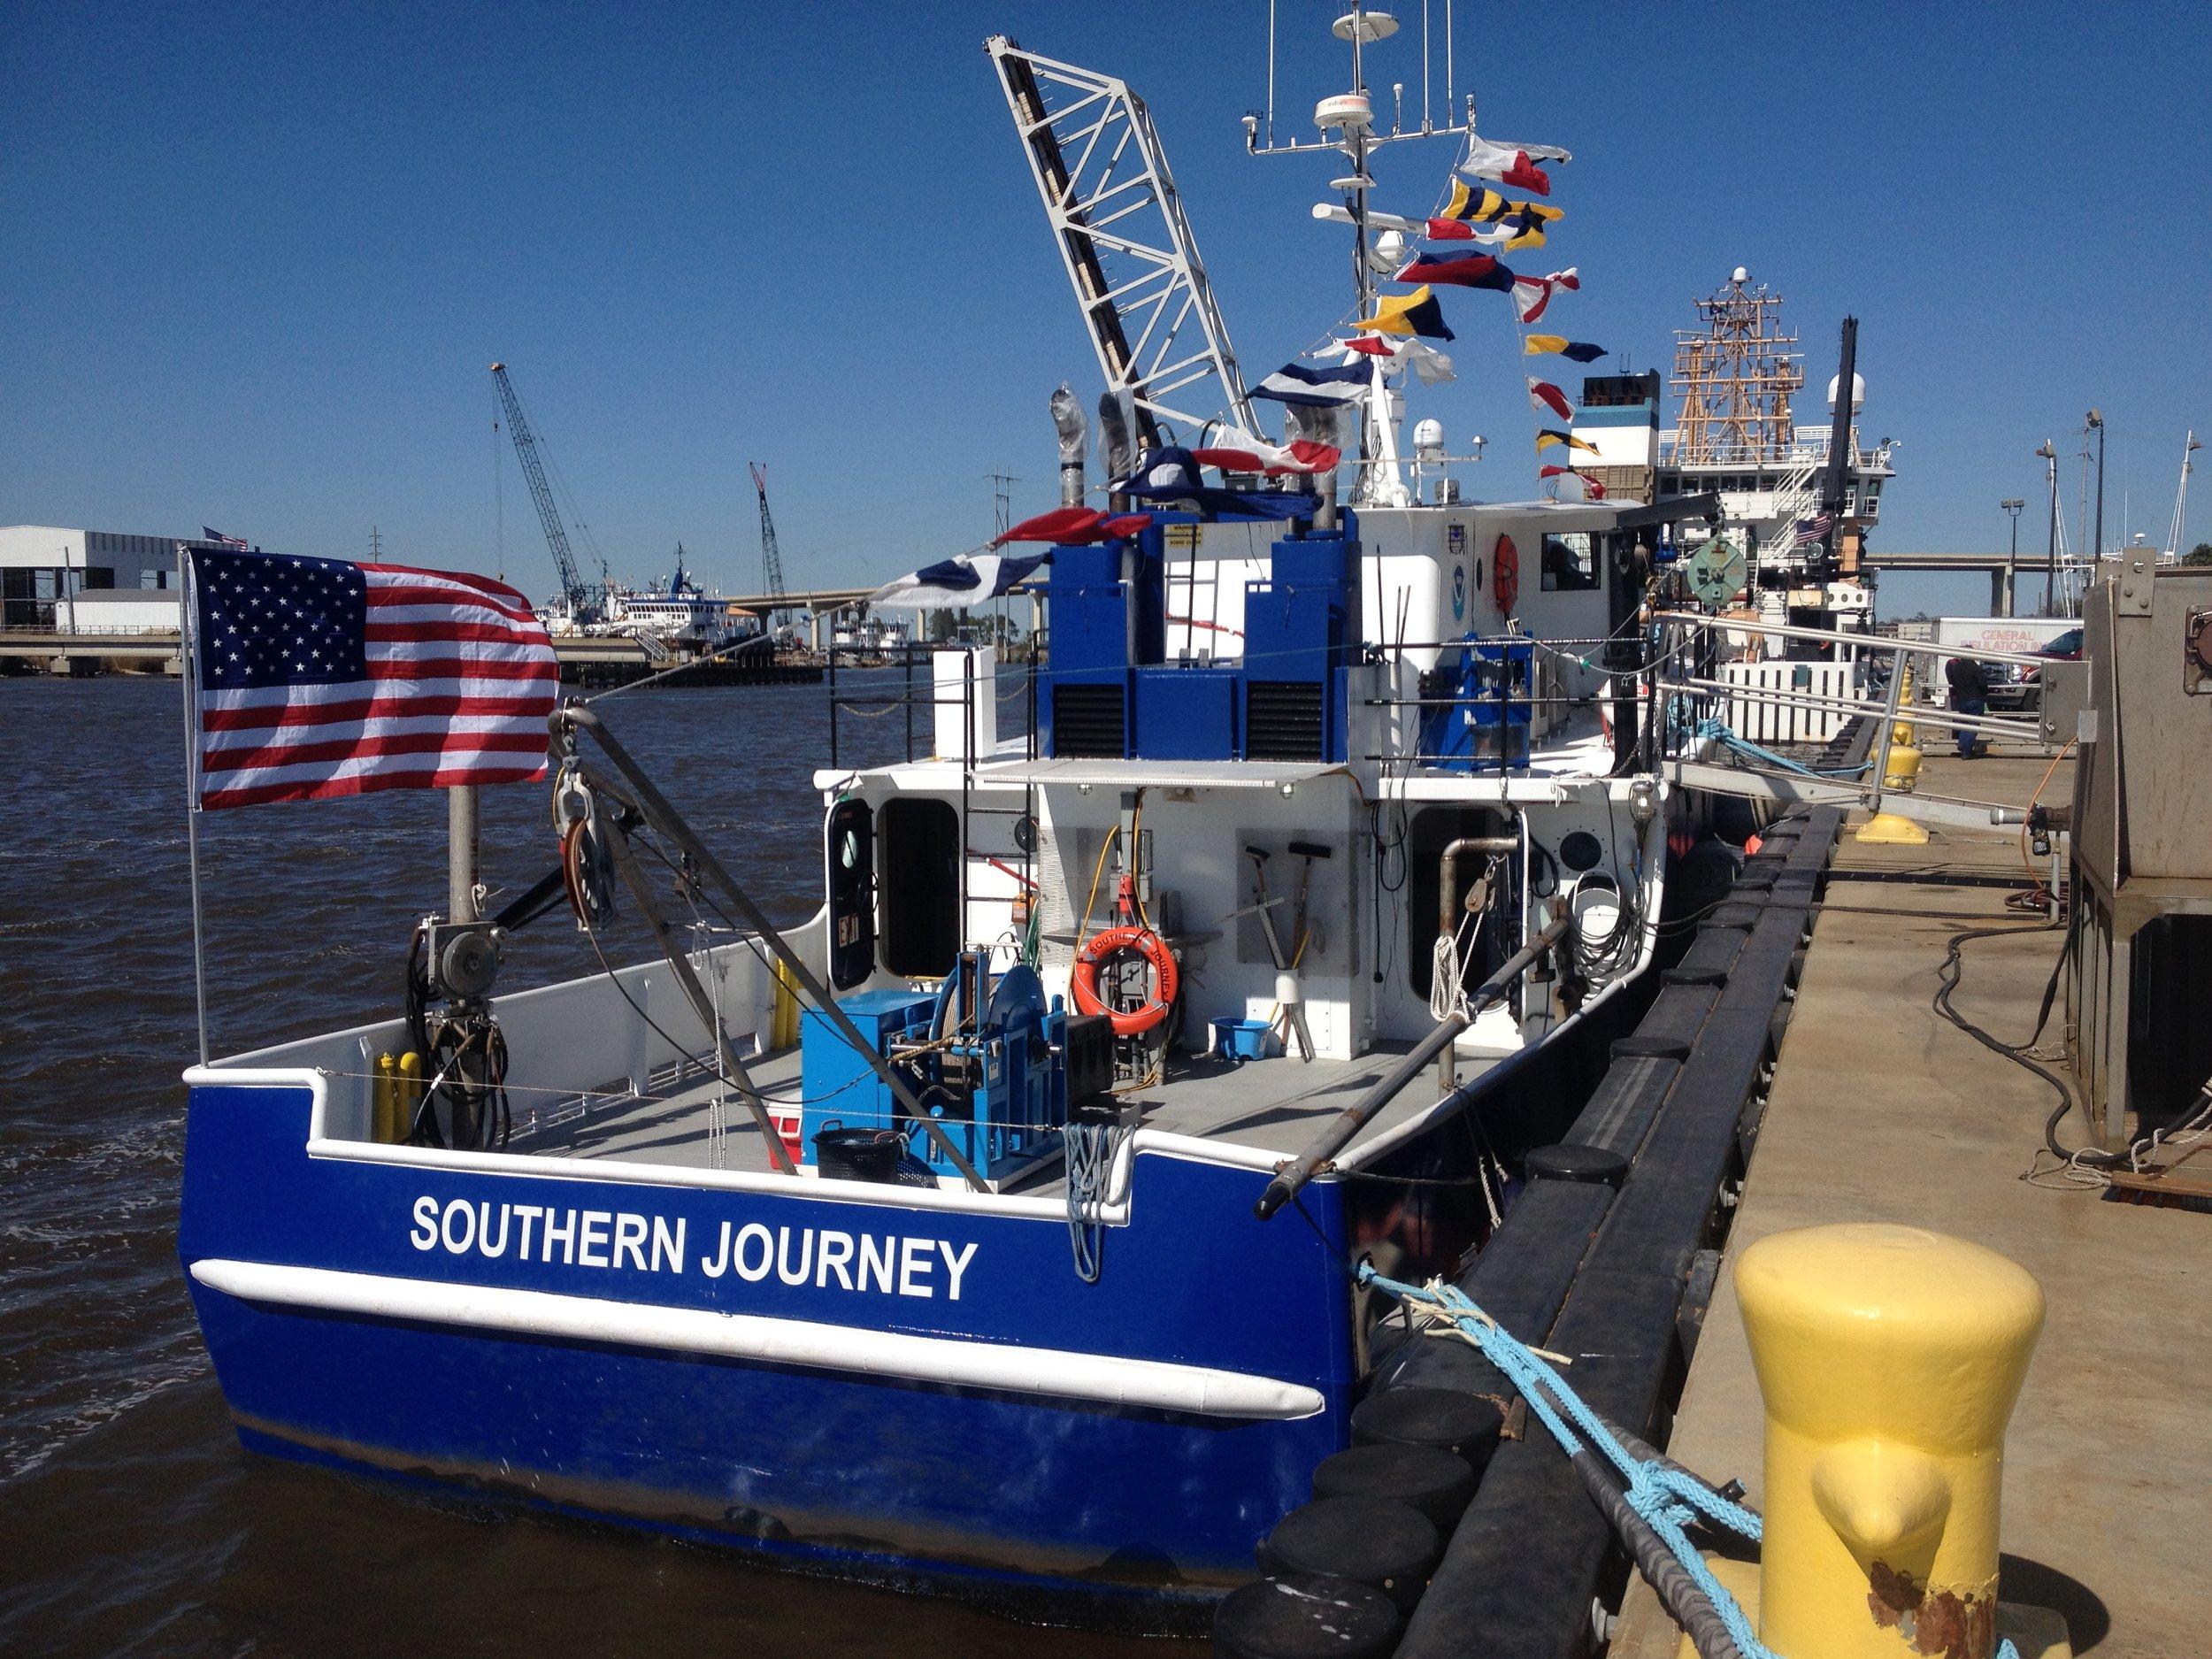 Southern Journey IMG_0267.JPG